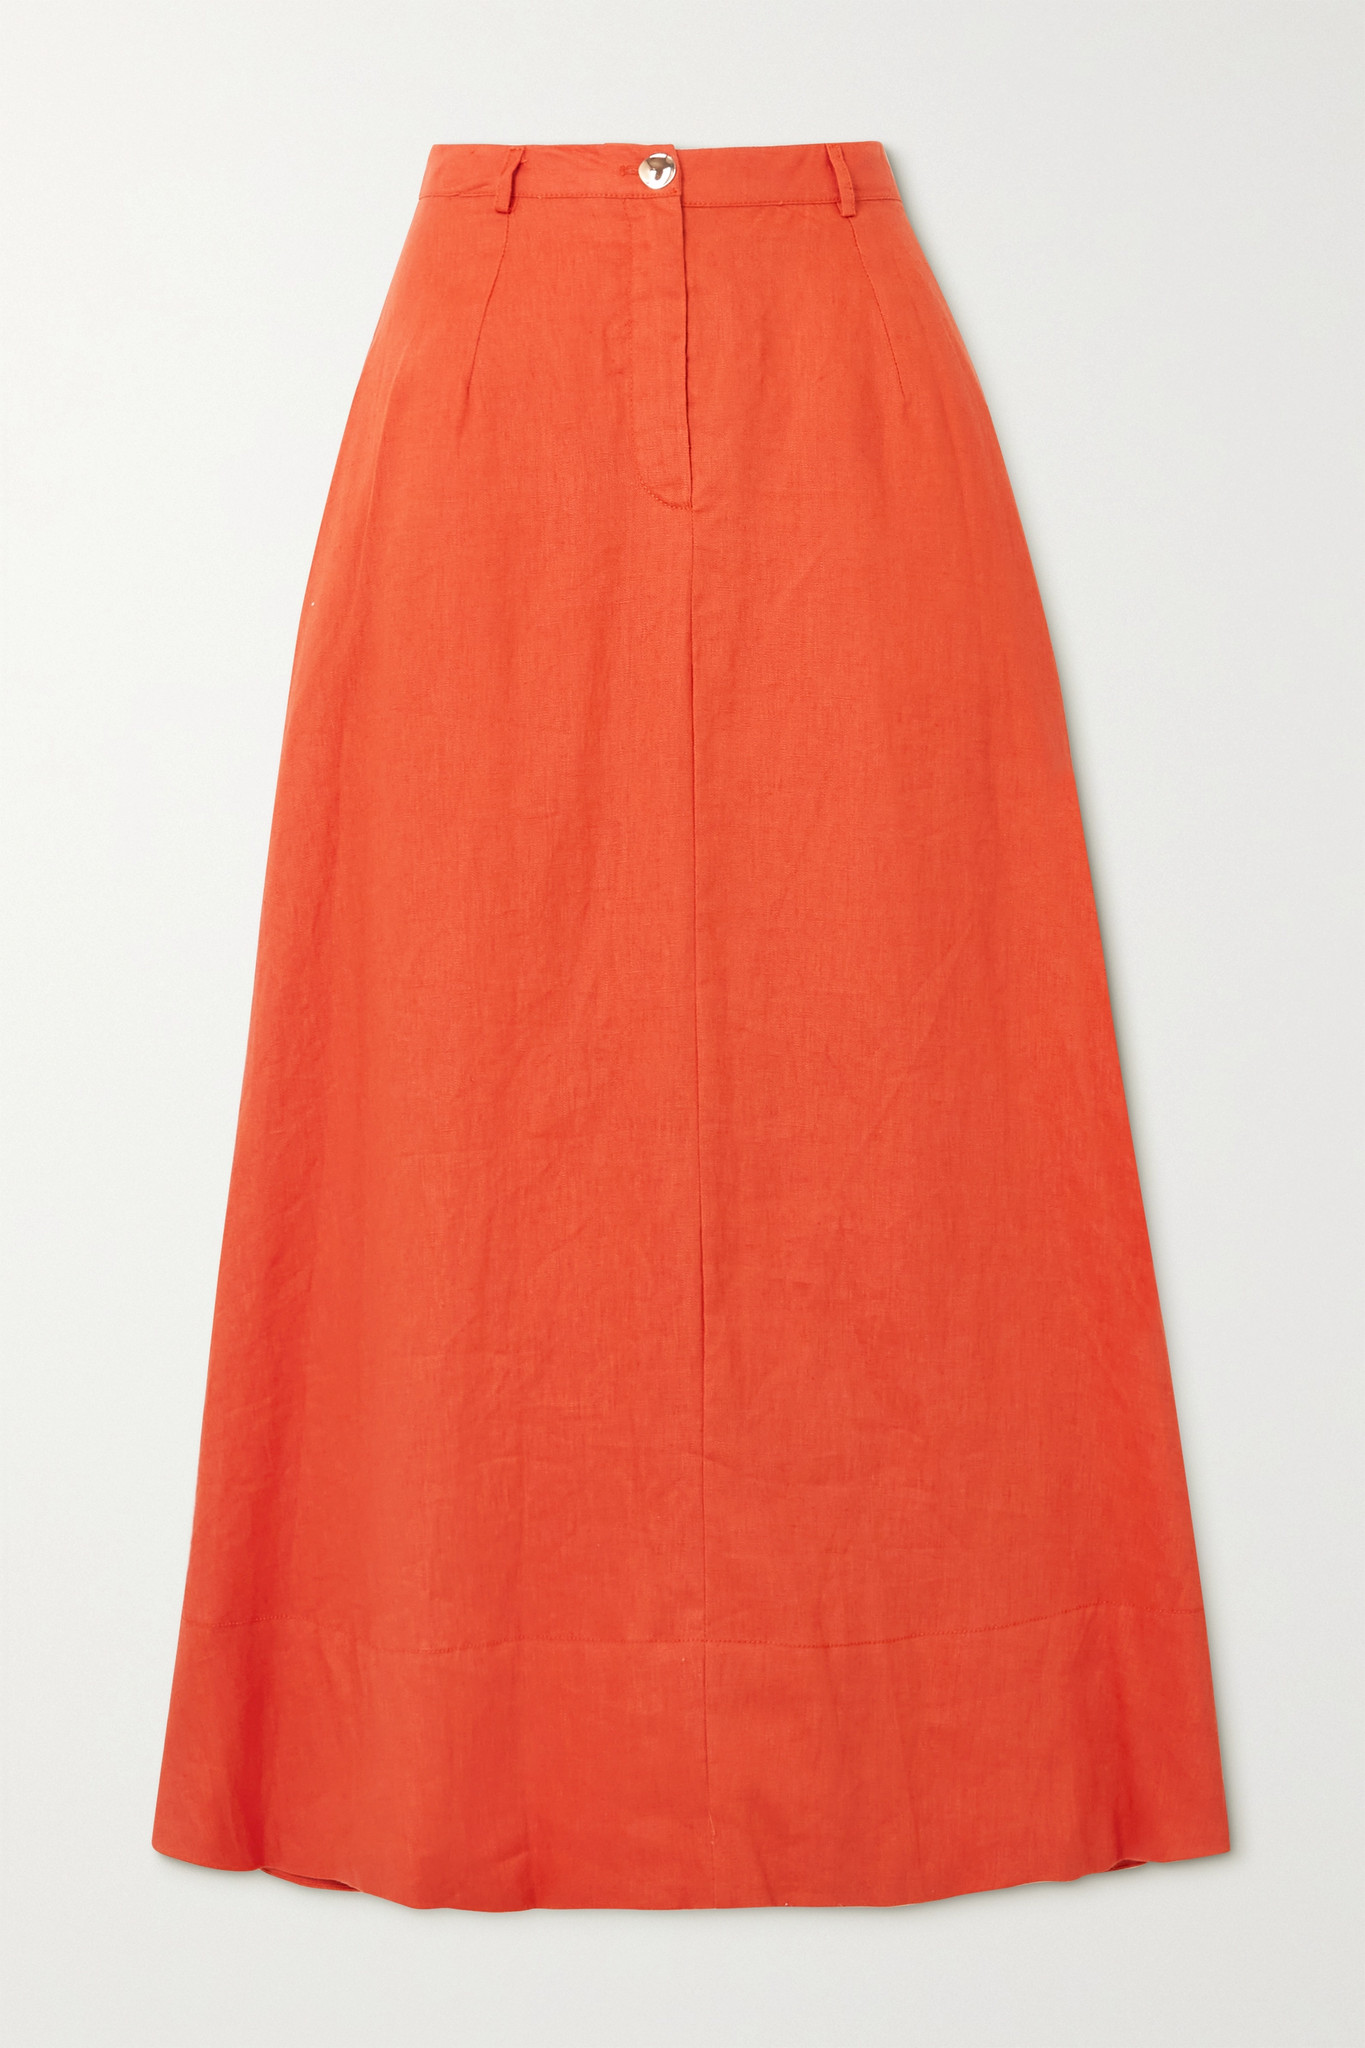 STAUD - Cybele 亚麻中长半身裙 - 橙色 - US2